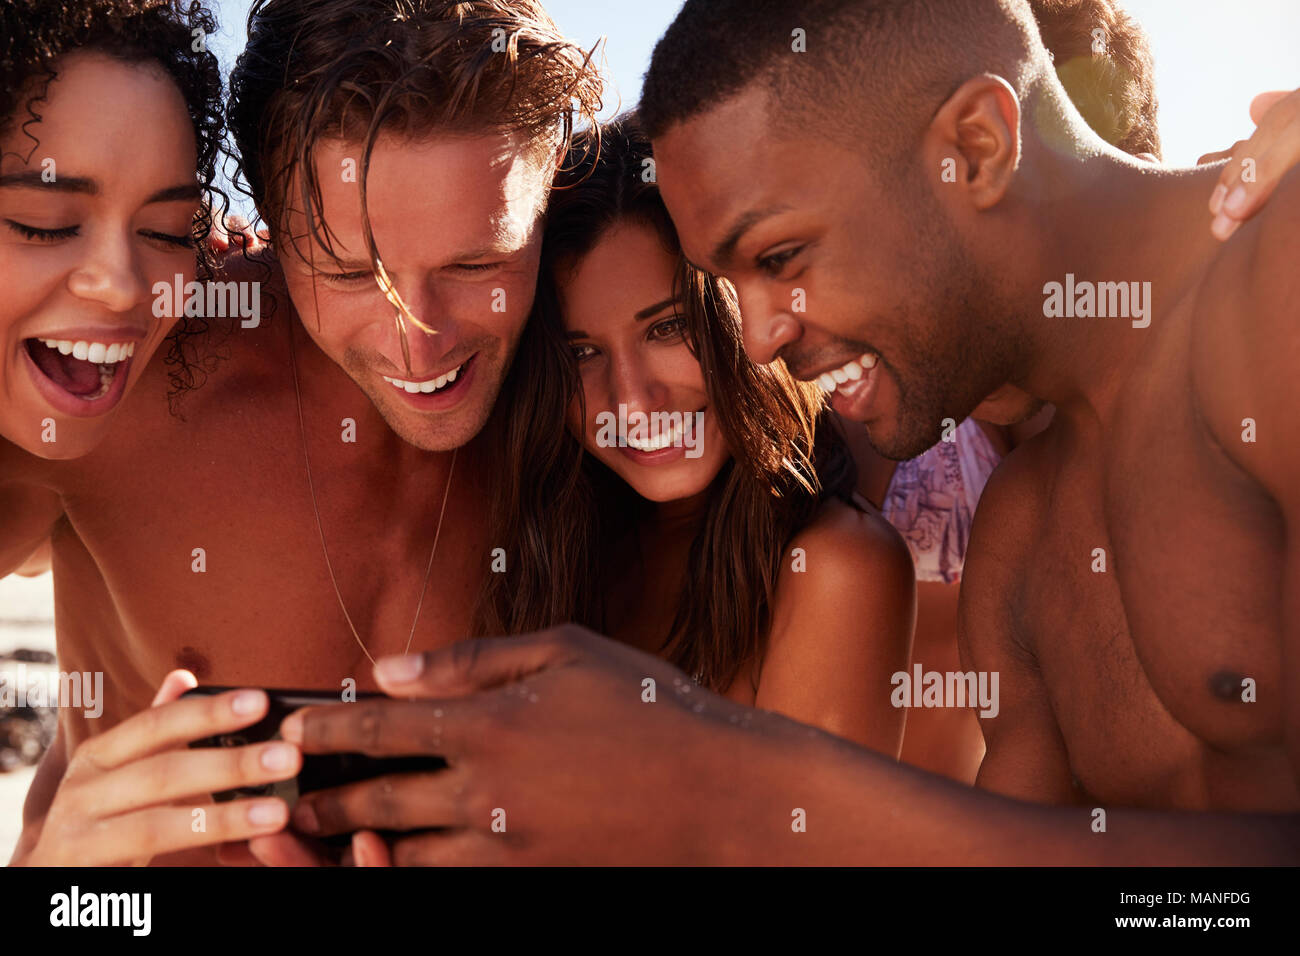 Freunde auf Strandurlaub im Foto auf dem Mobiltelefon Stockbild